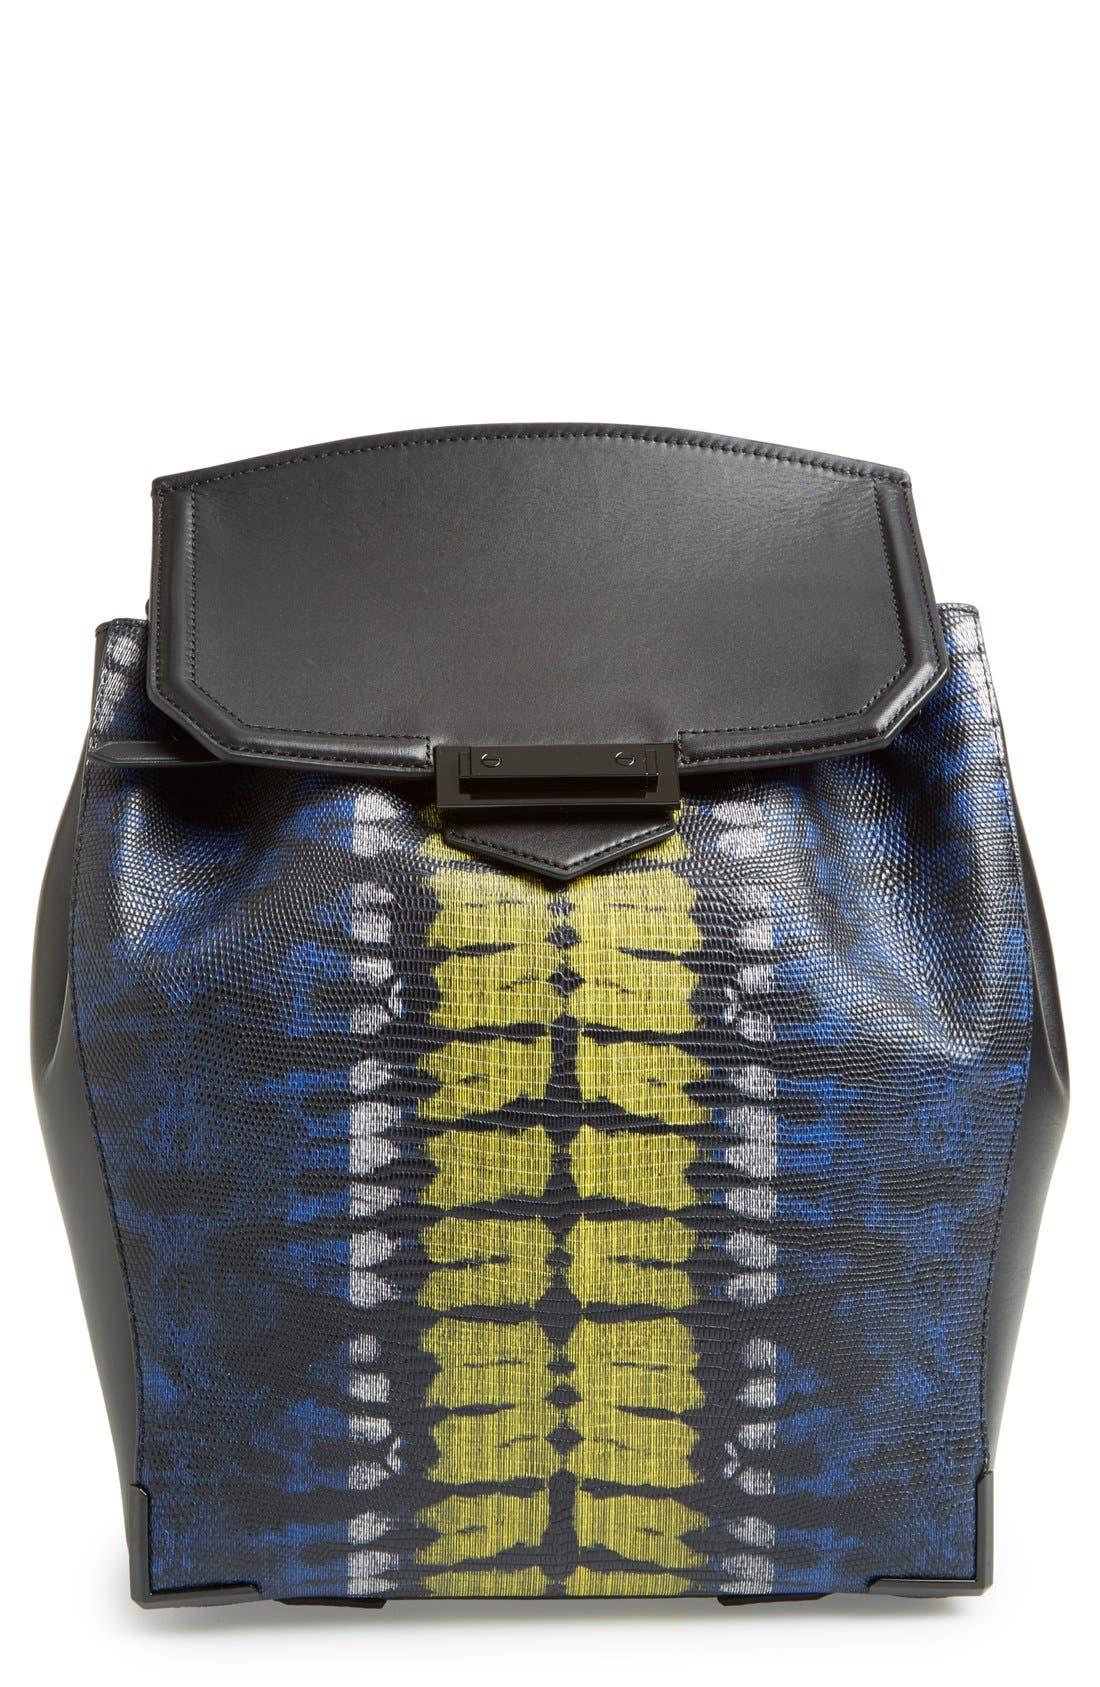 Main Image - Alexander Wang 'Prisma' Lizard Embossed Backpack